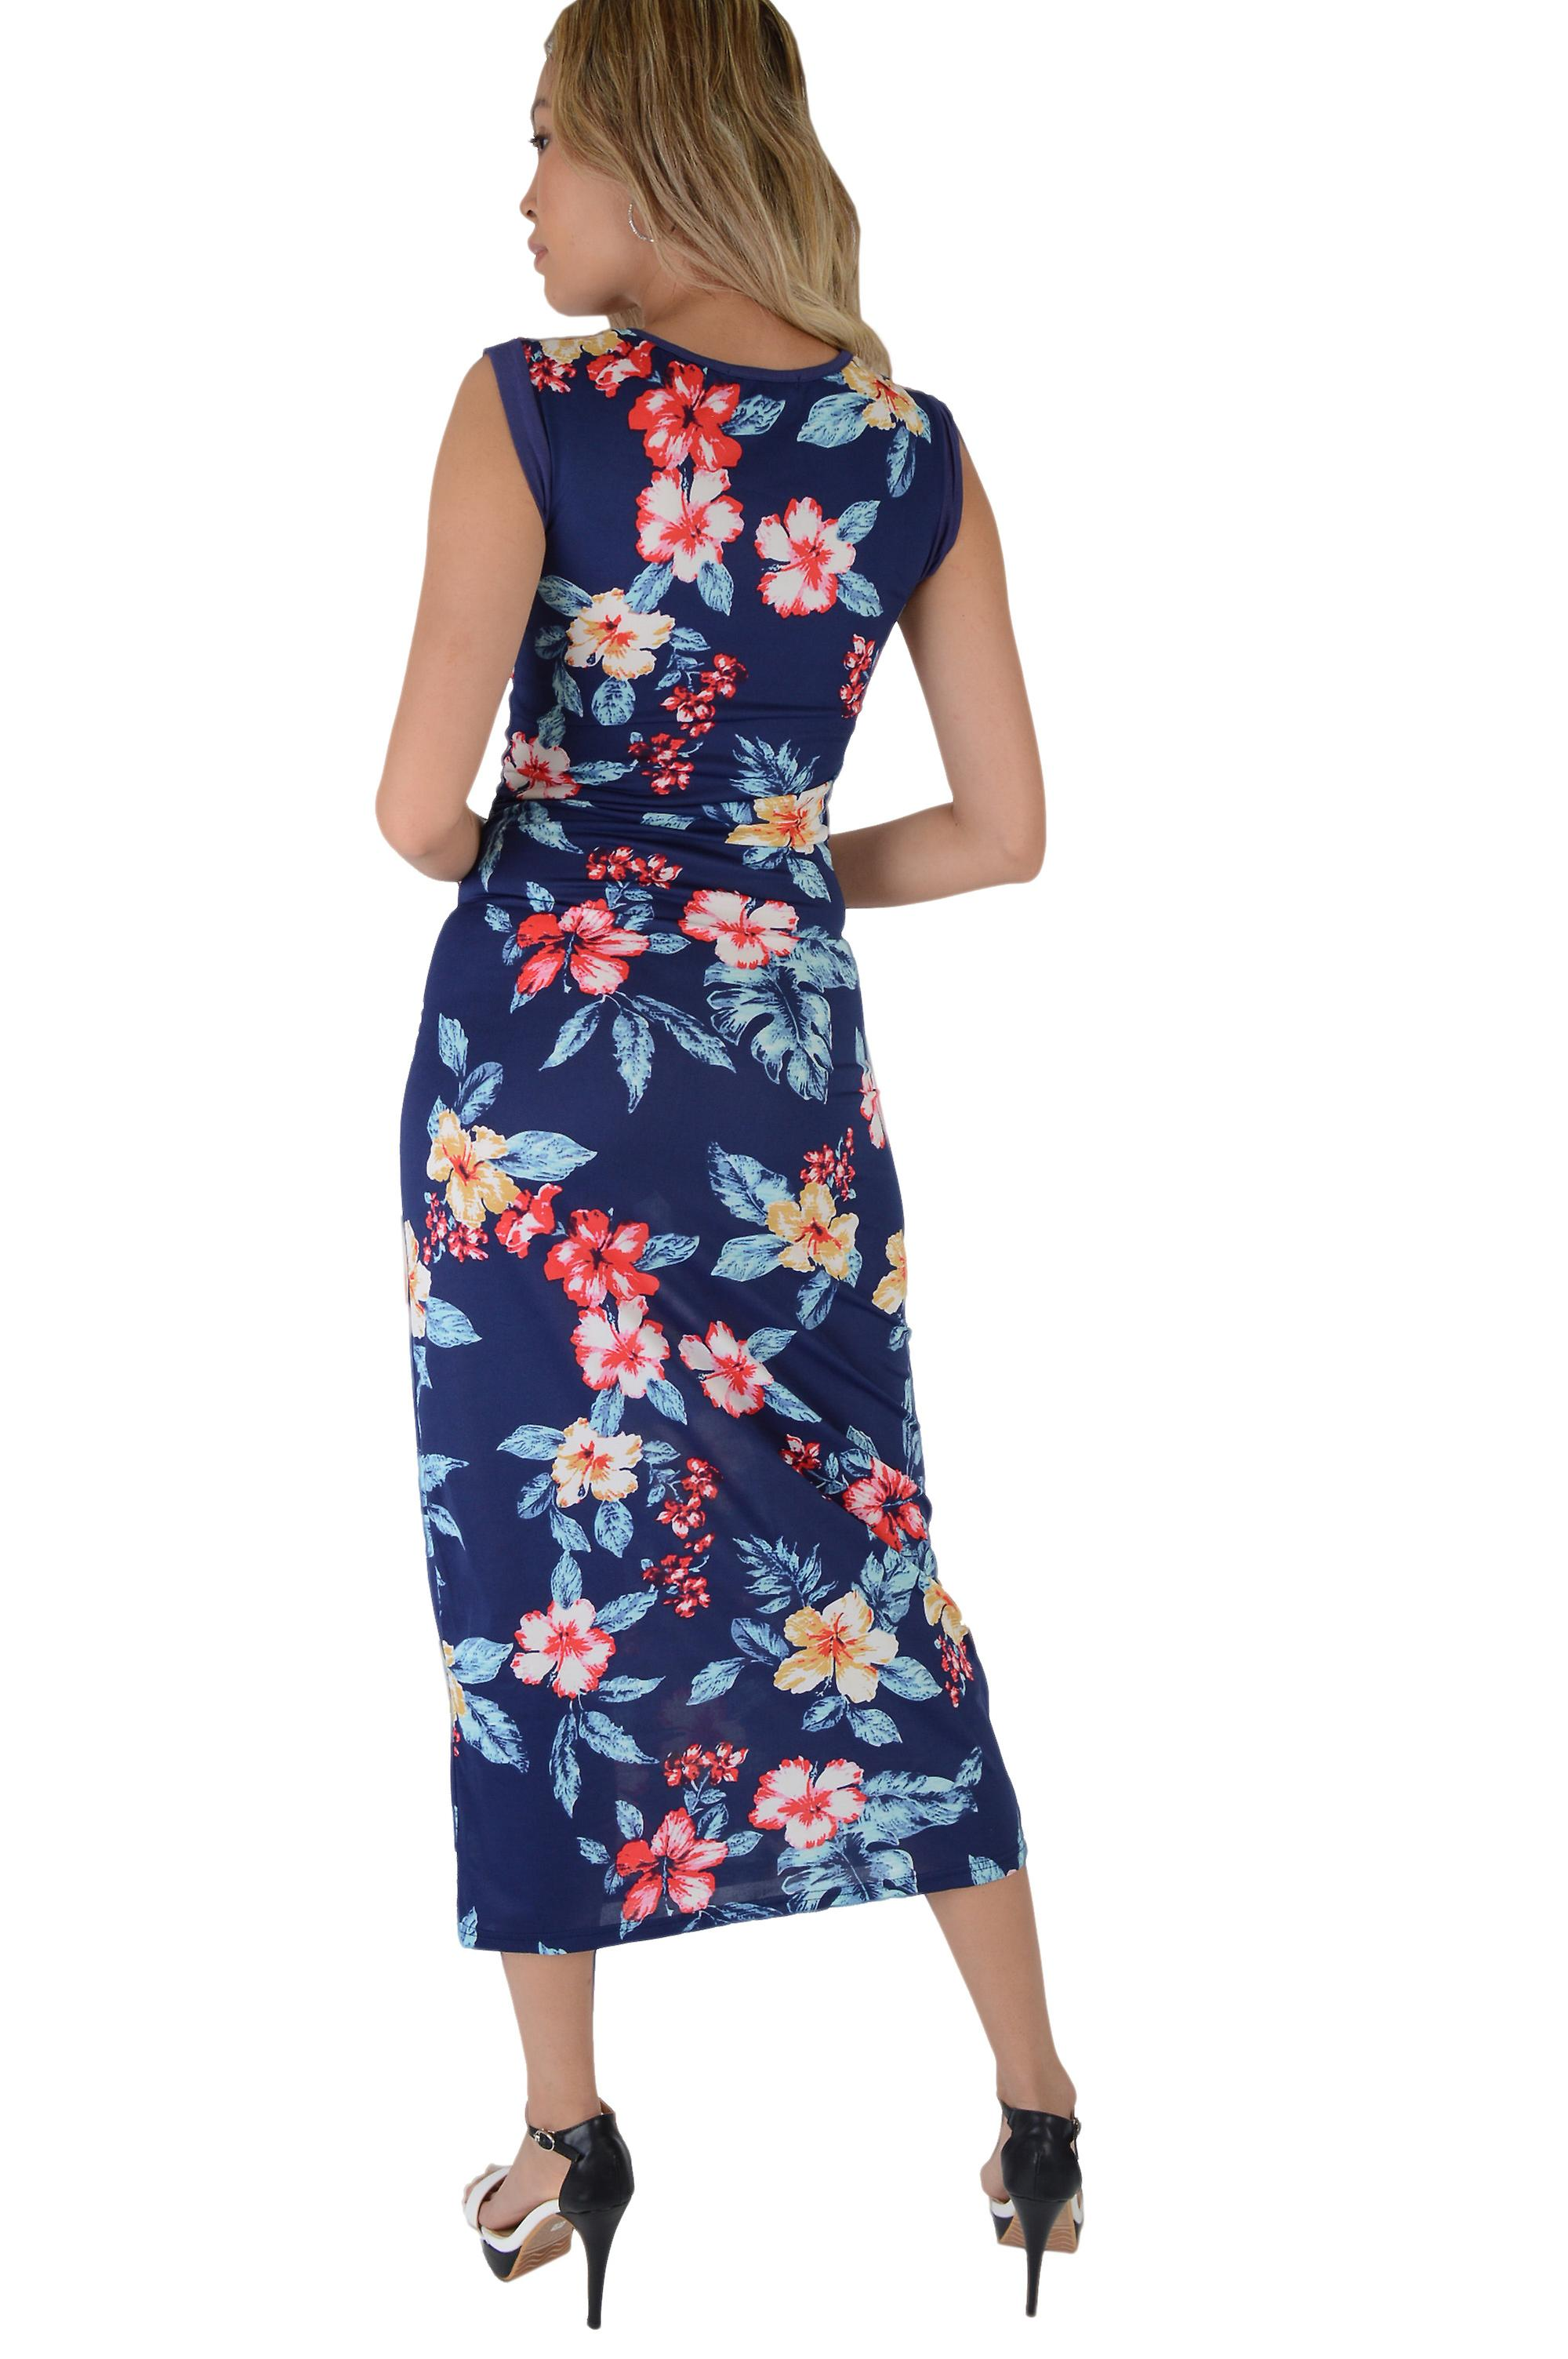 Lovemystyle Navy Blue Floral Bodycon Maxi Dress - SAMPLE